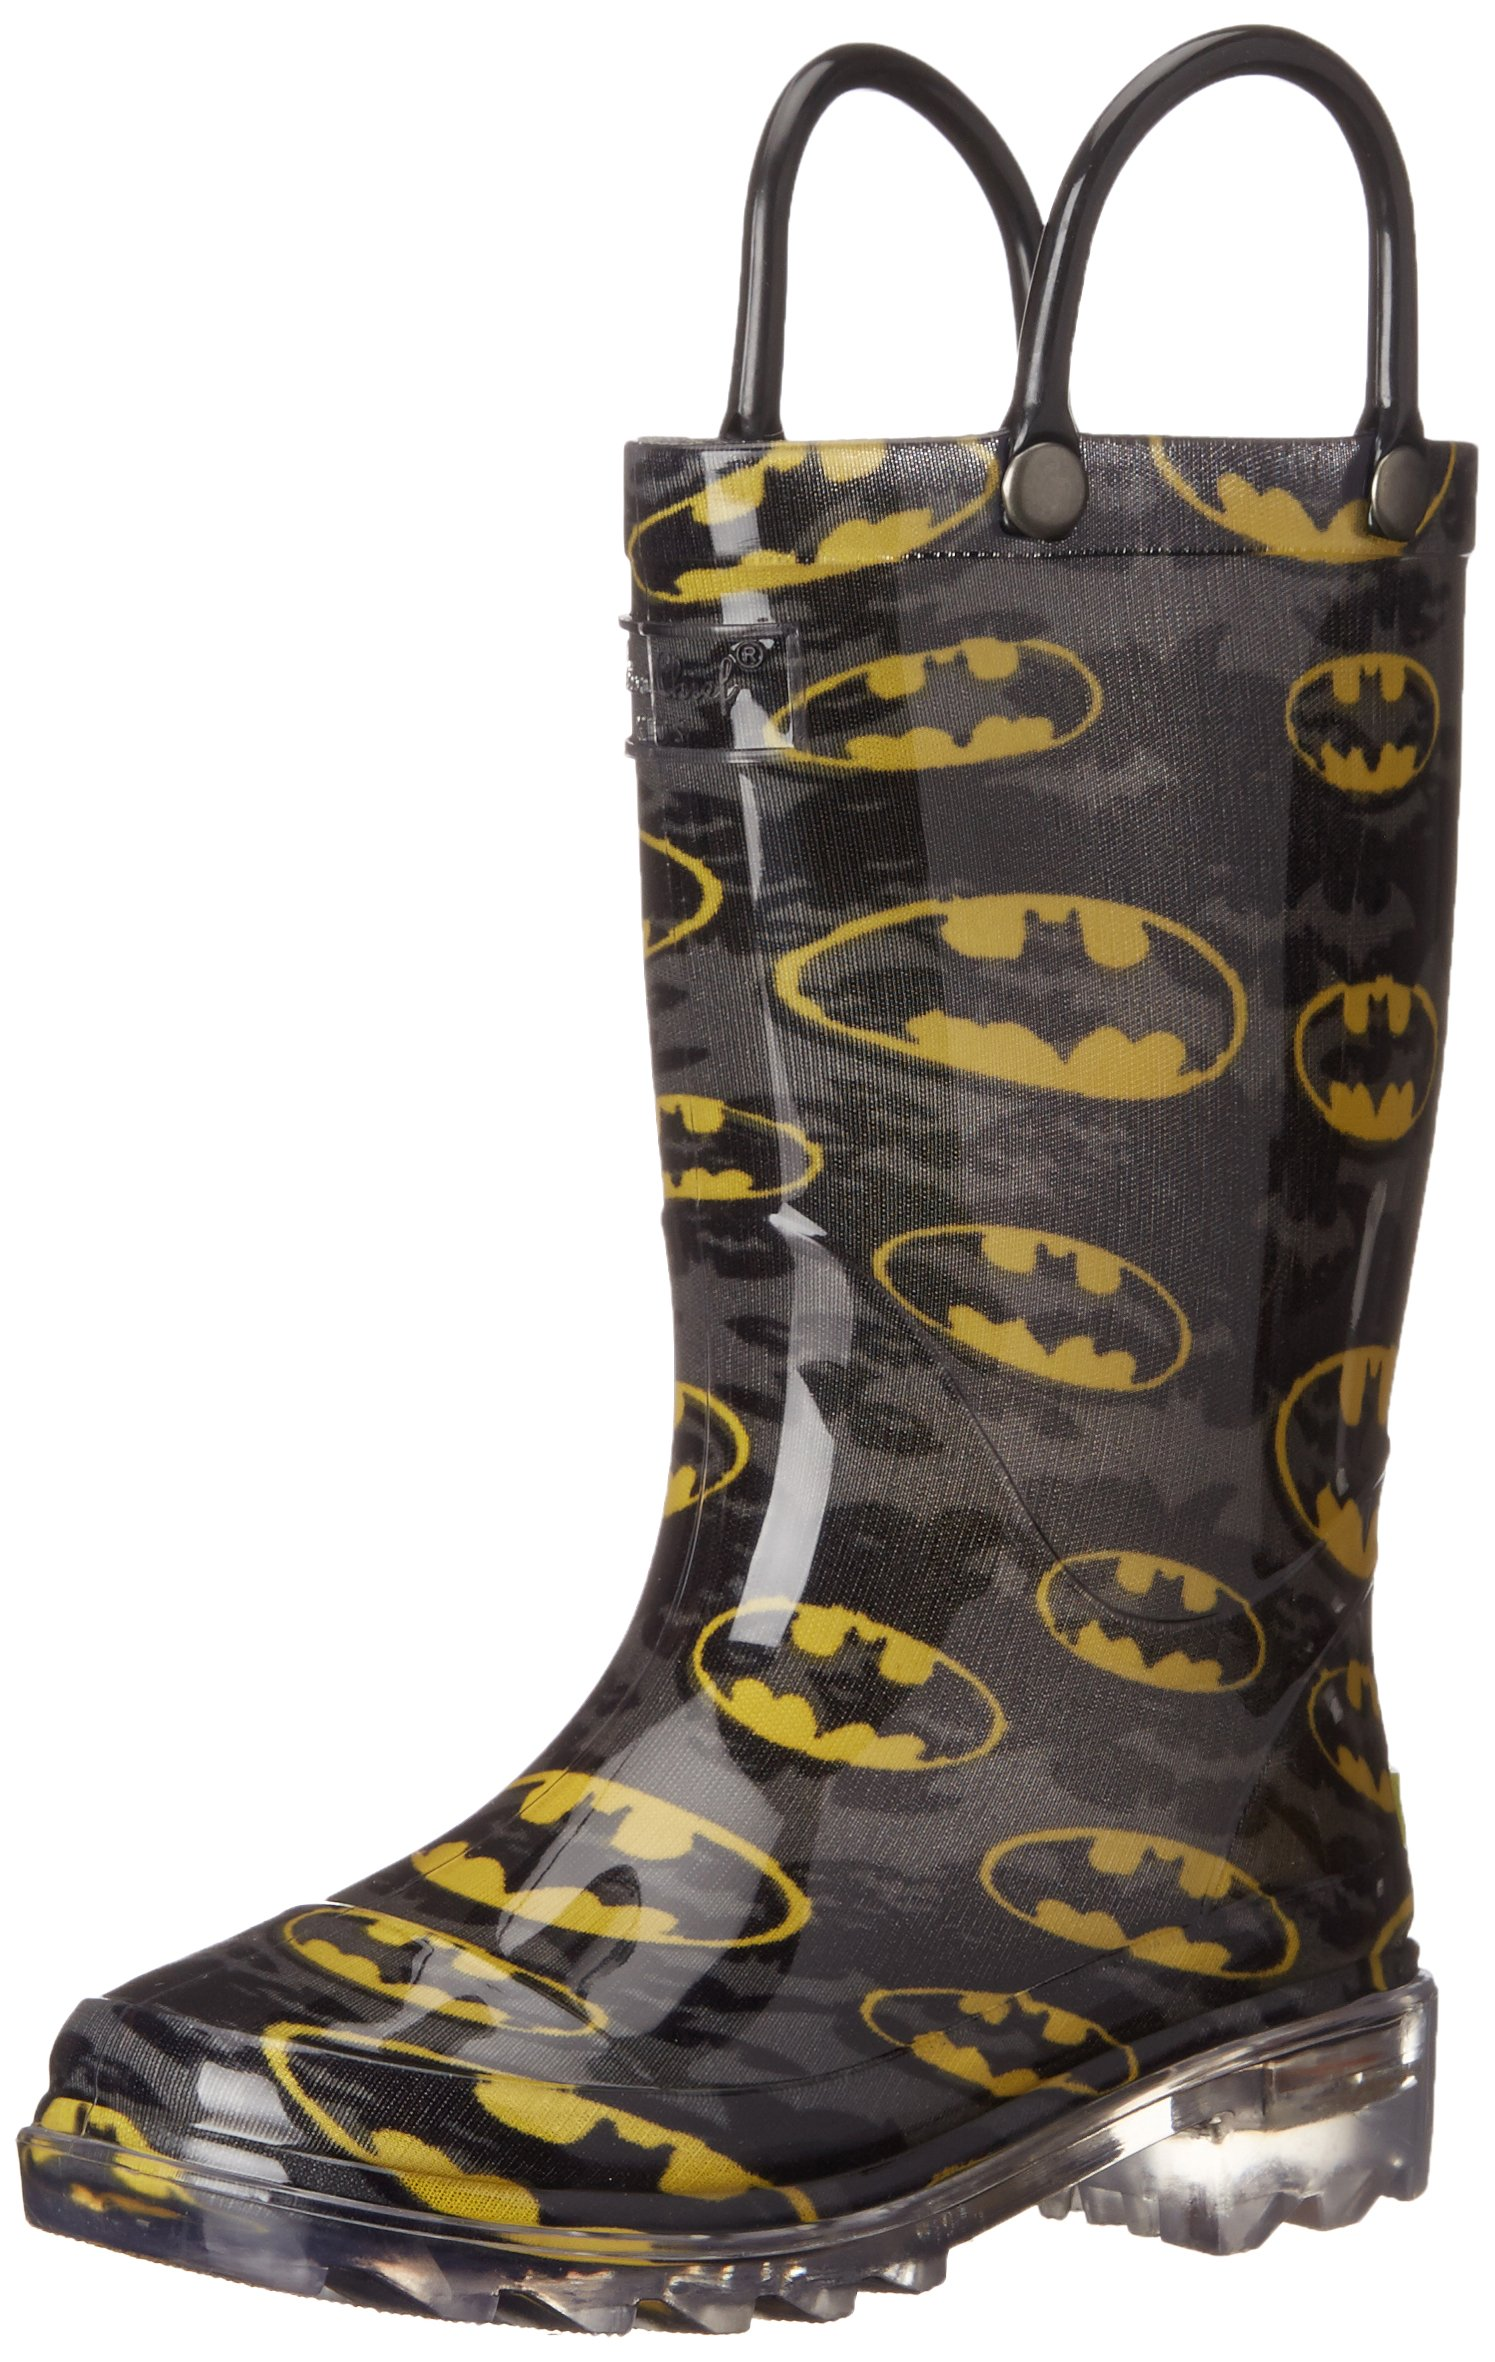 Western Chief Kids Waterproof D.C. Comics Character Rain Boots with Easy on Handles, Light-up Batman, 12 M US Little Kid